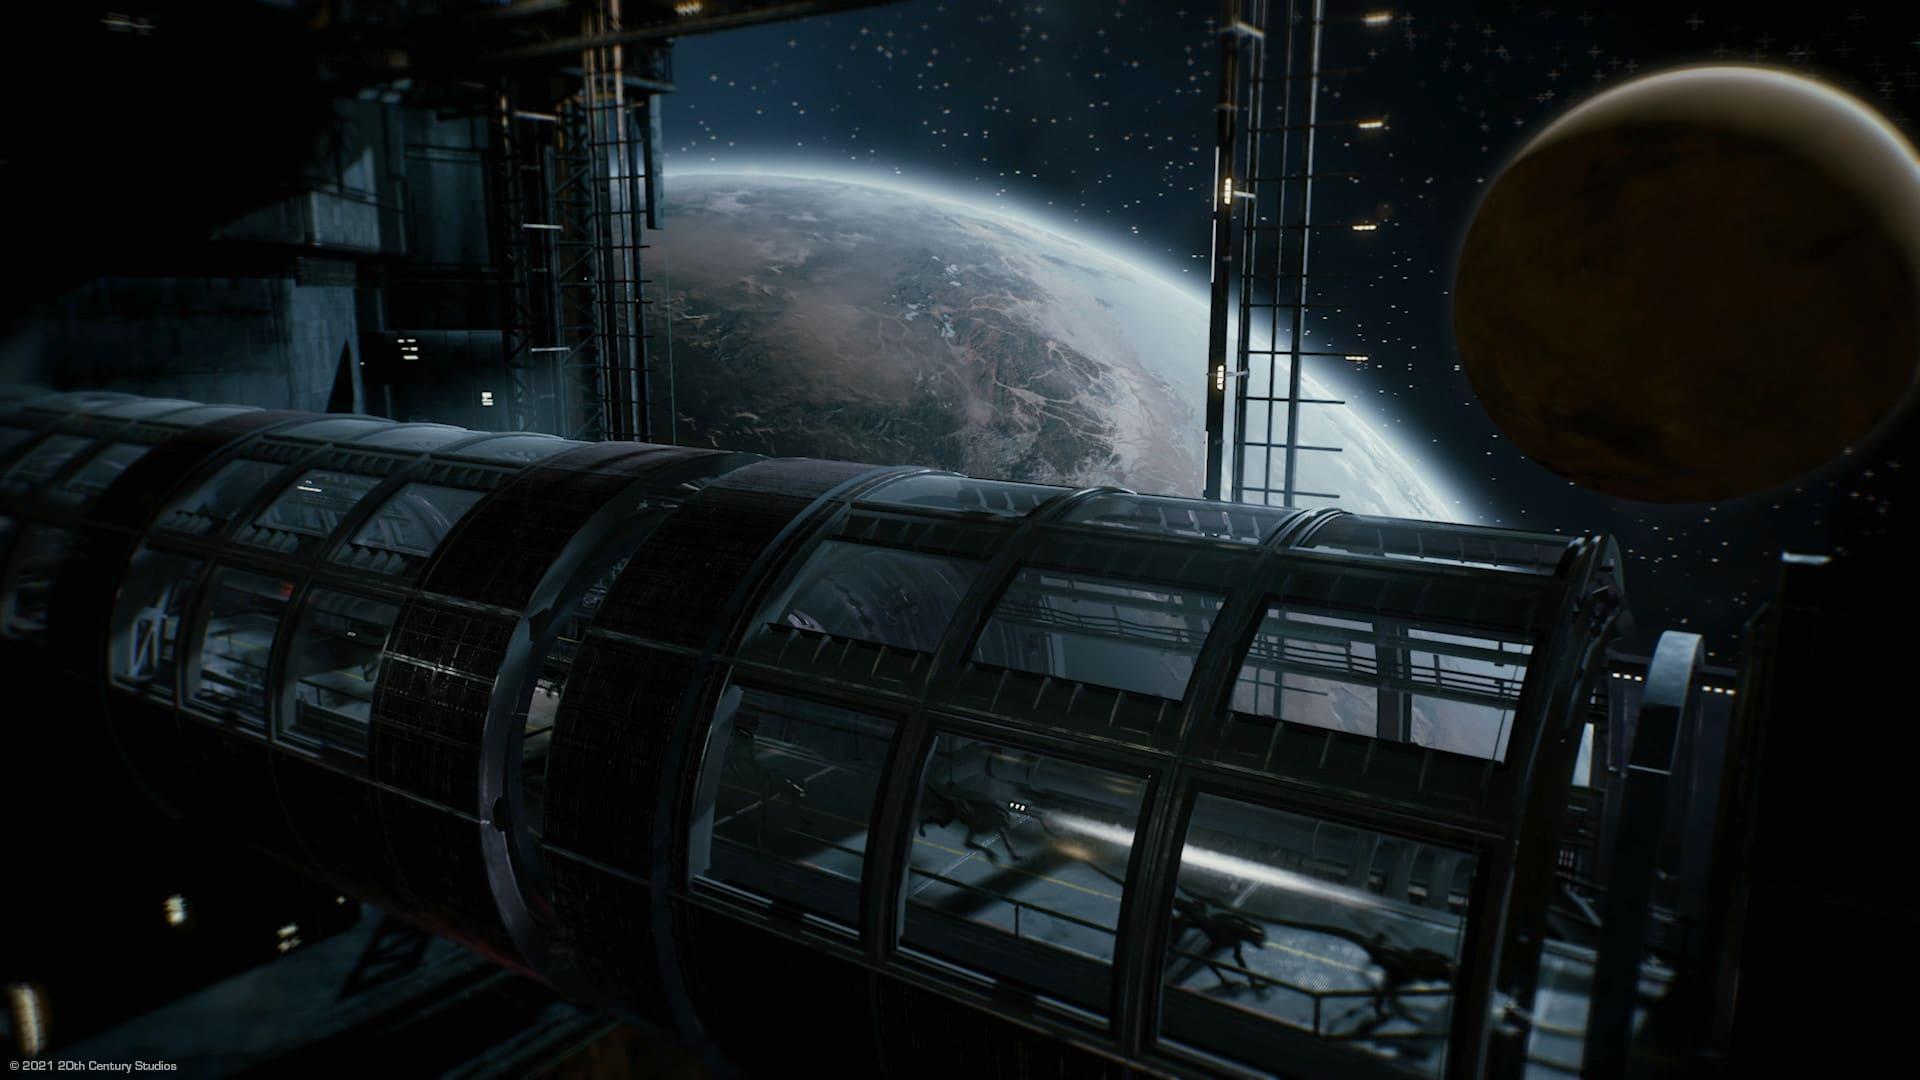 cold iron studios aliens: fireteam elite is a ridley scott prometheus sequel story black goo engineers ship